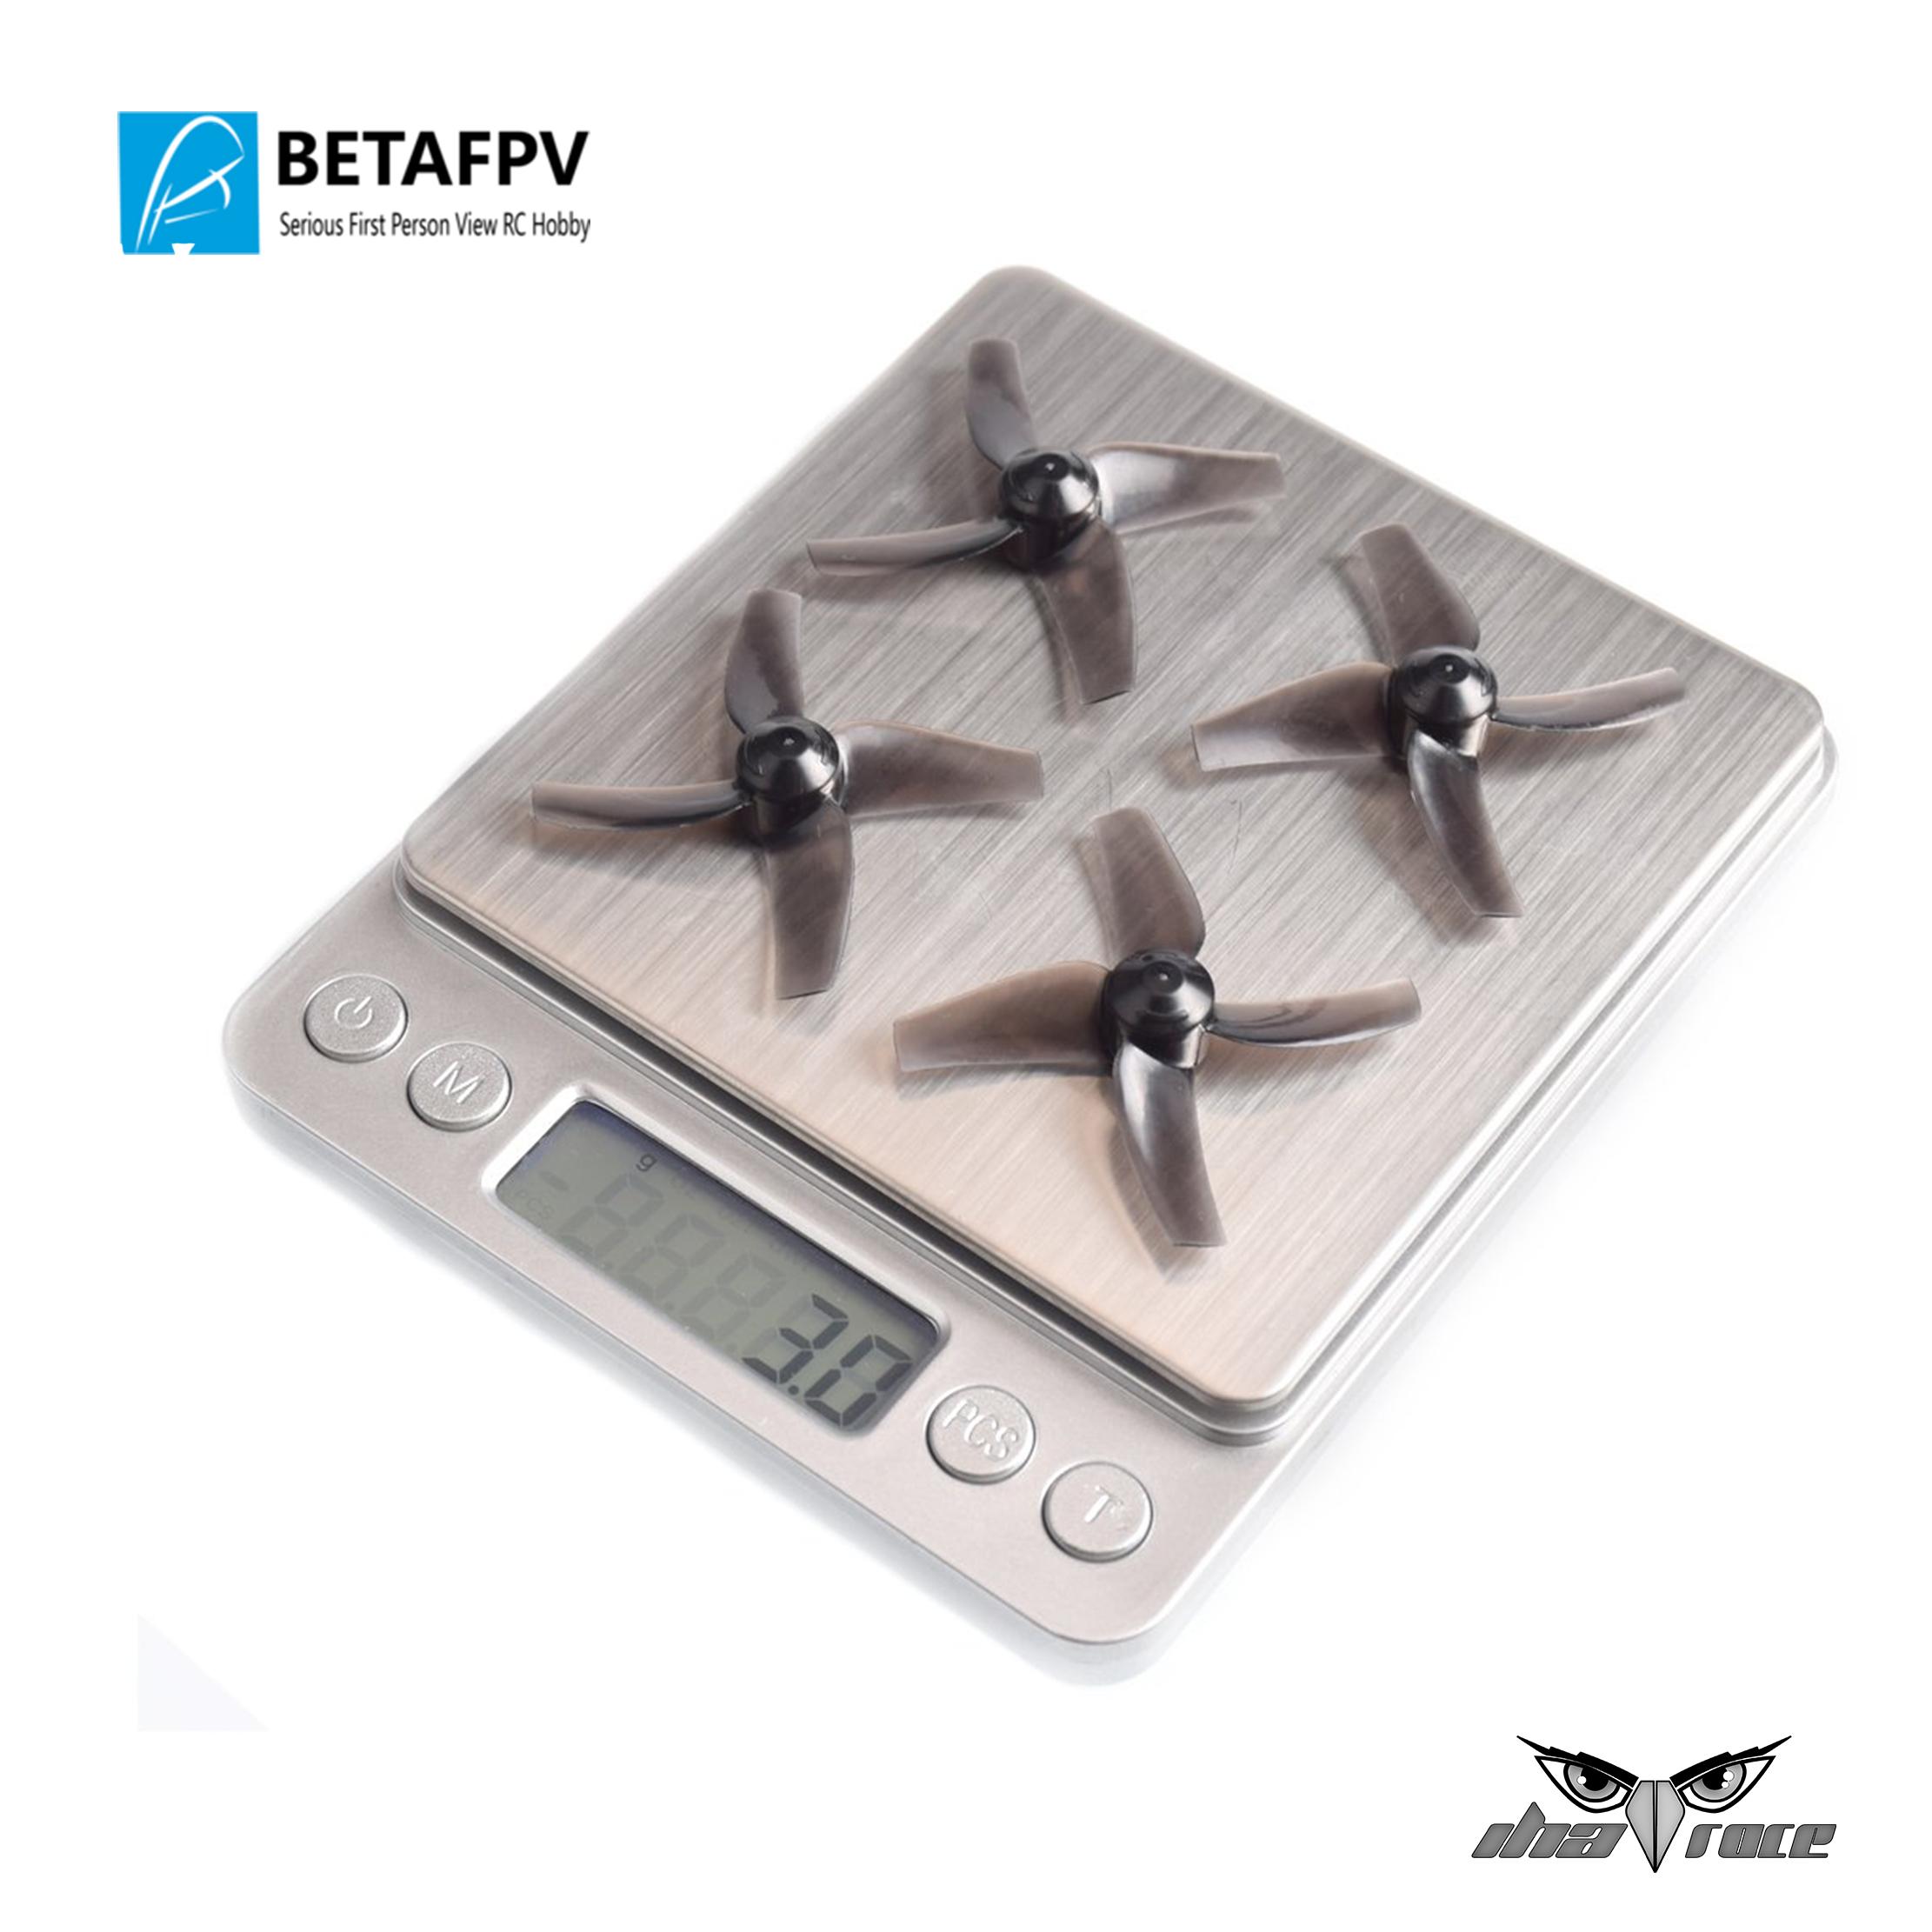 Hélices BetaFPV 4 palas 48 mm para HX100 (Eje 1.5mm)